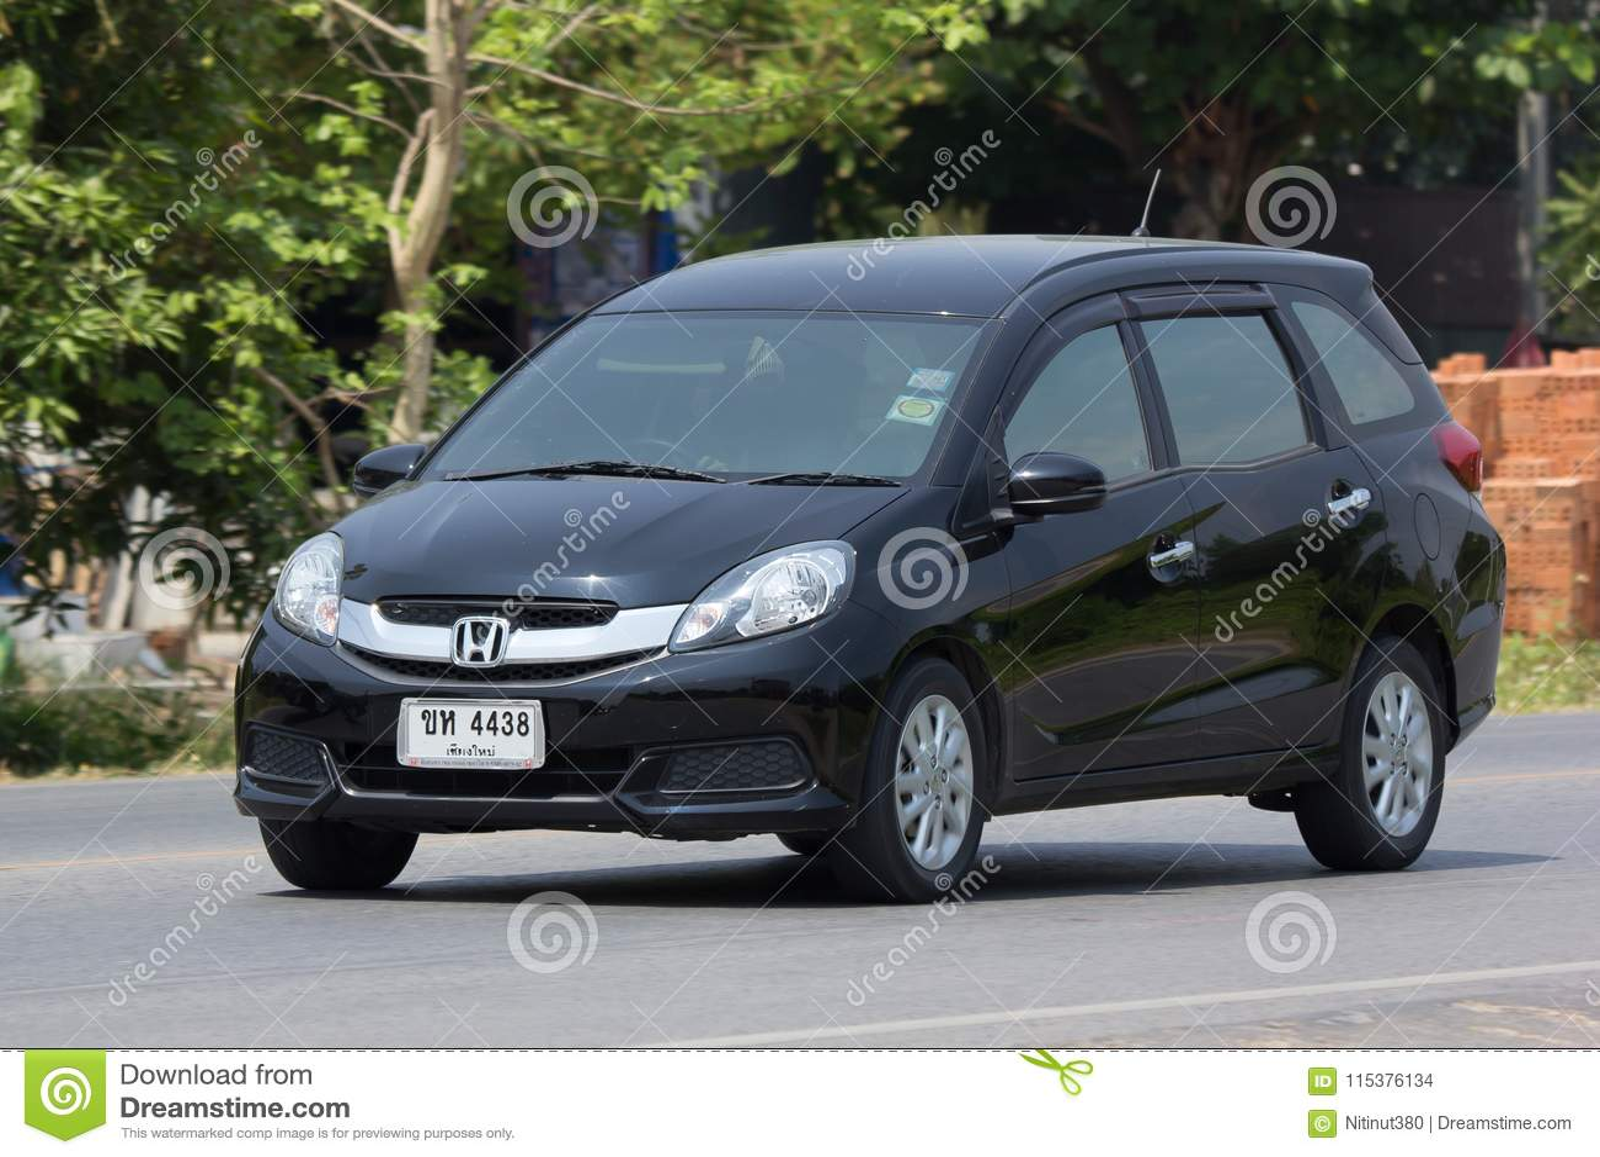 Private Honda Mobilio Van Editorial Stock Image Image Of Modern